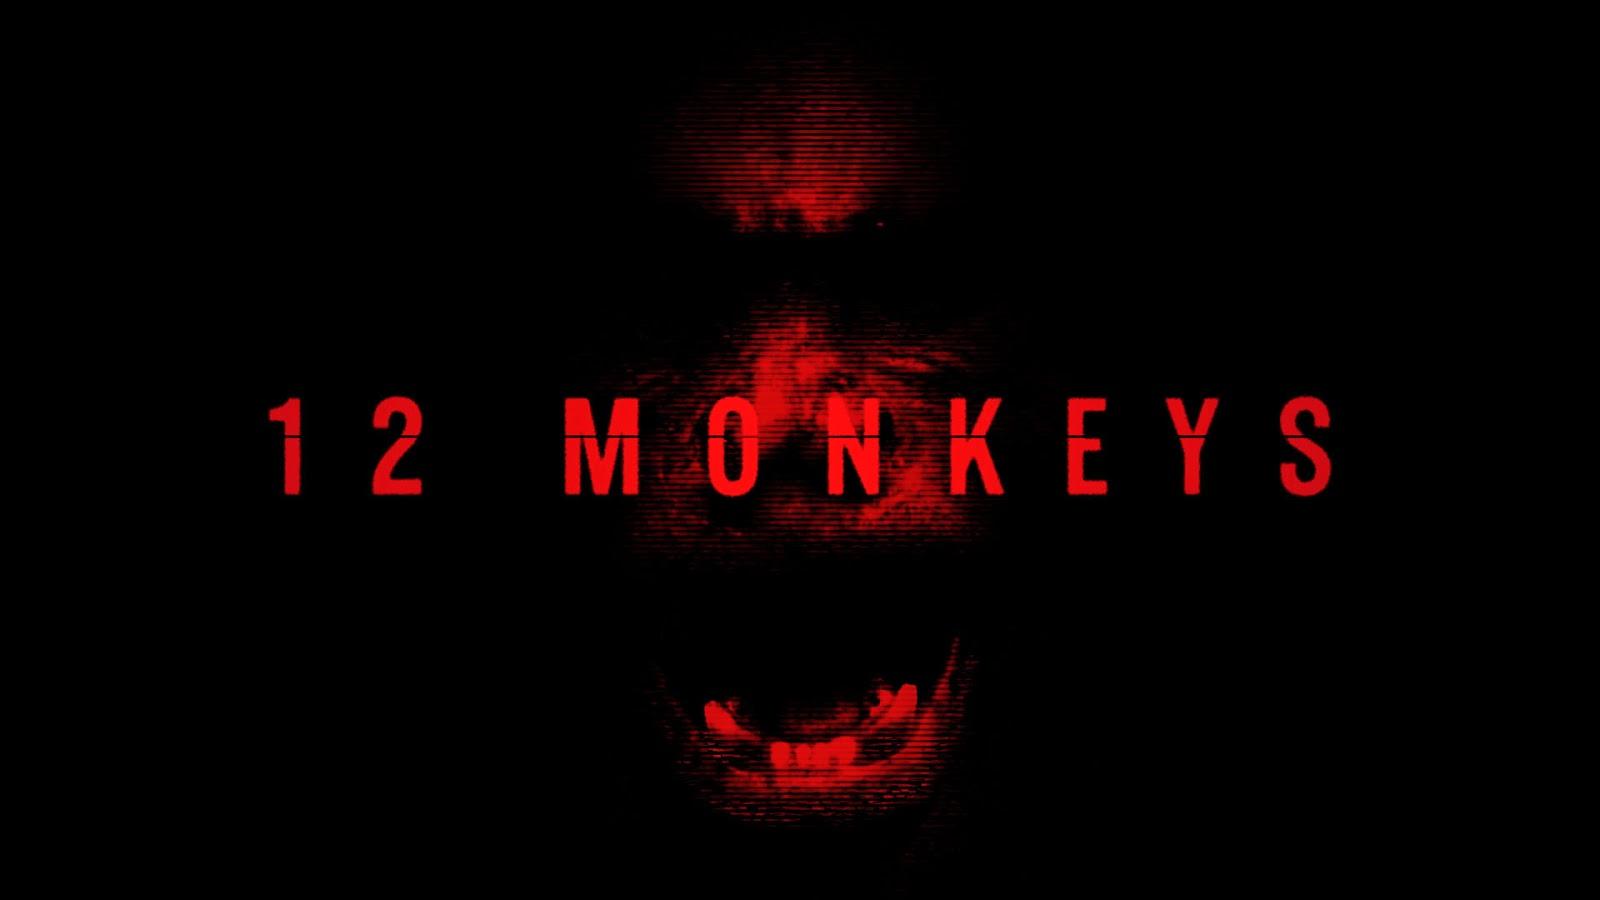 Syfy pilot trash] 12 Monkeys - shitting on the past to